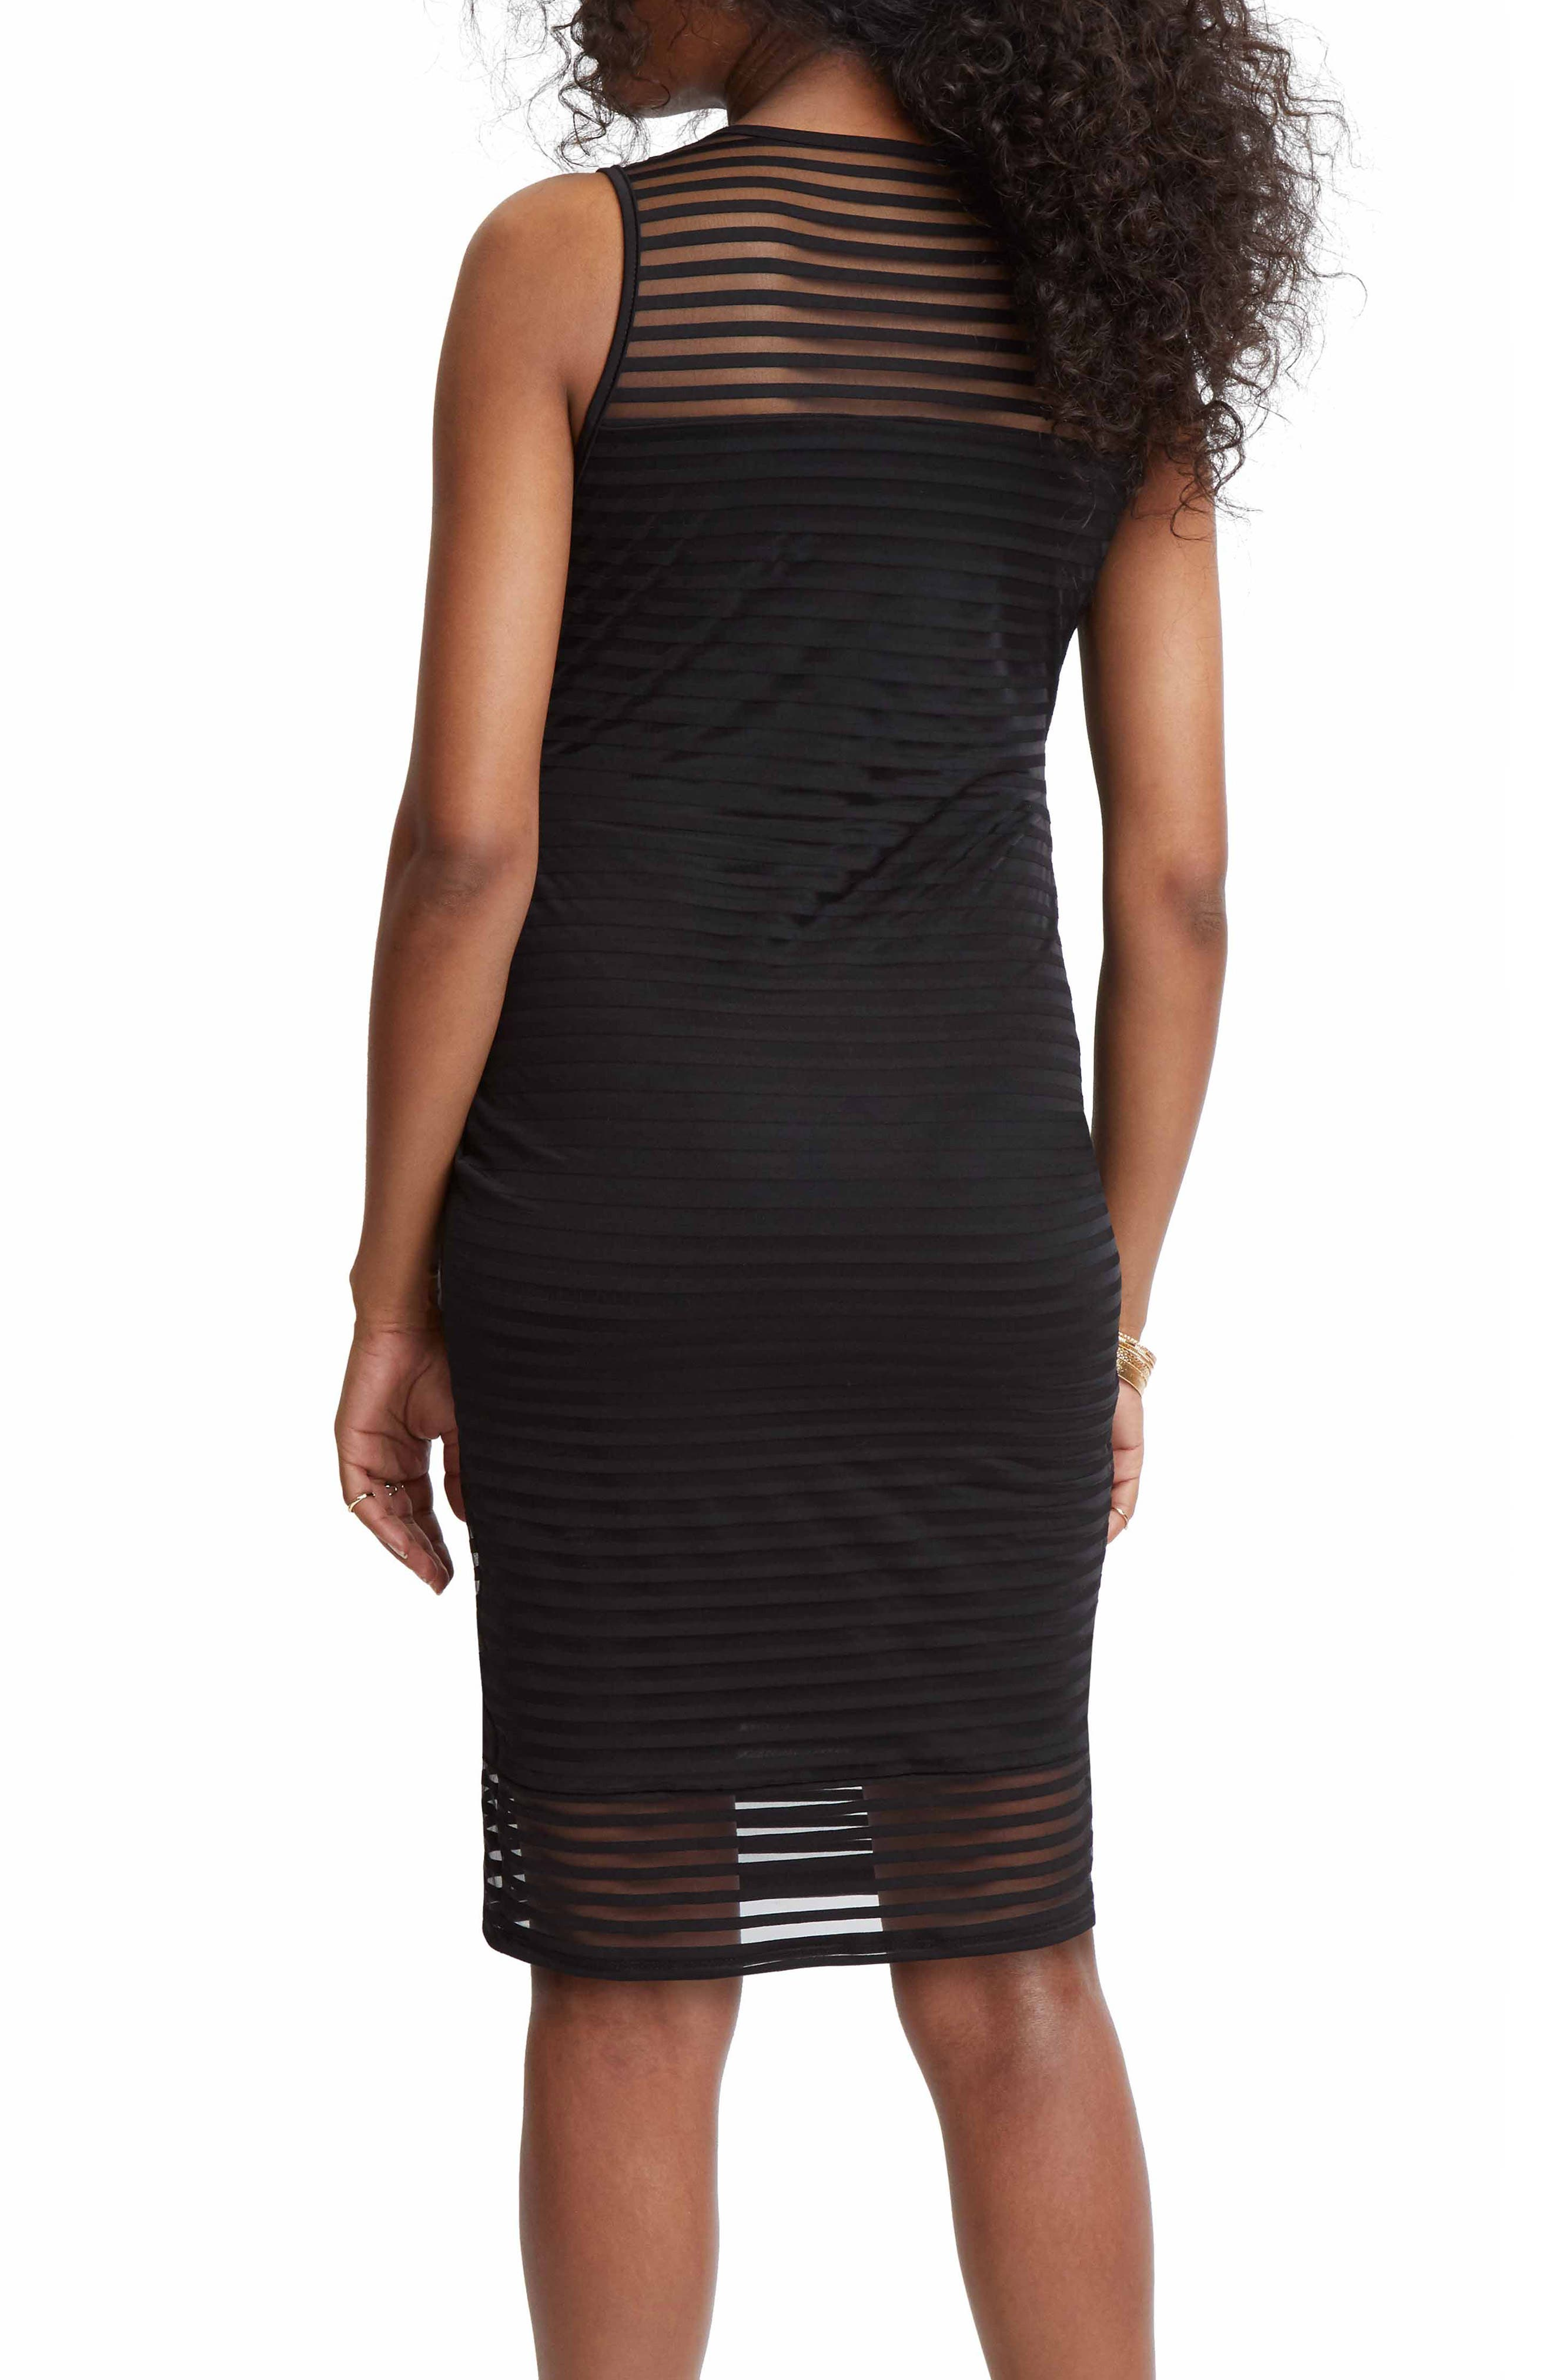 STOWAWAY COLLECTION,                             Shadow Stripe Maternity Sheath Dress,                             Alternate thumbnail 2, color,                             BLACK